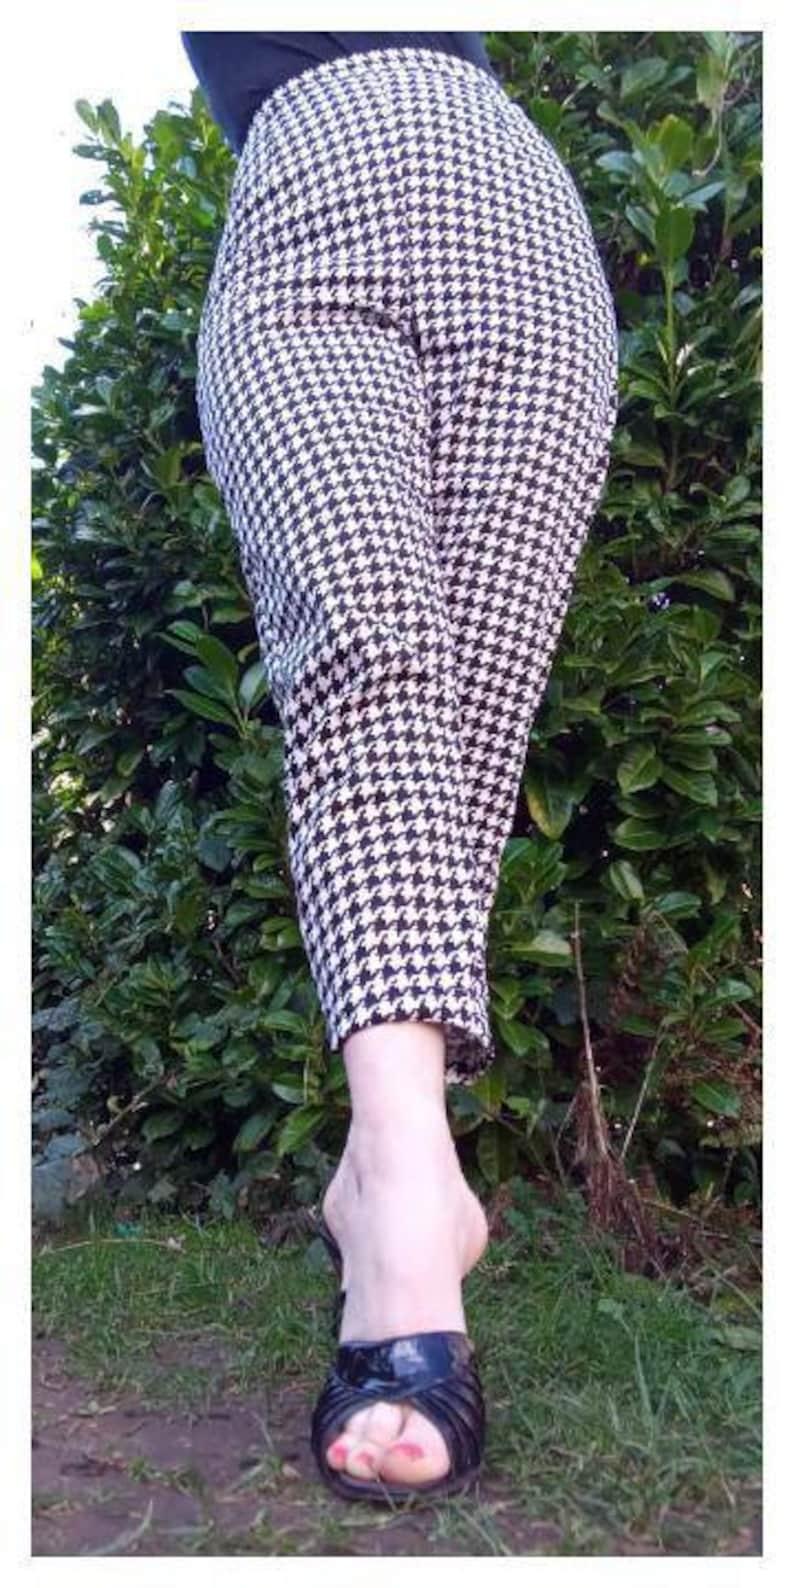 1950s Pants & Jeans- High Waist, Wide Leg, Capri, Pedal Pushers Vintage 1950s 1960s style hounds tooth cigarette pants long Capri trousers black and white $72.51 AT vintagedancer.com